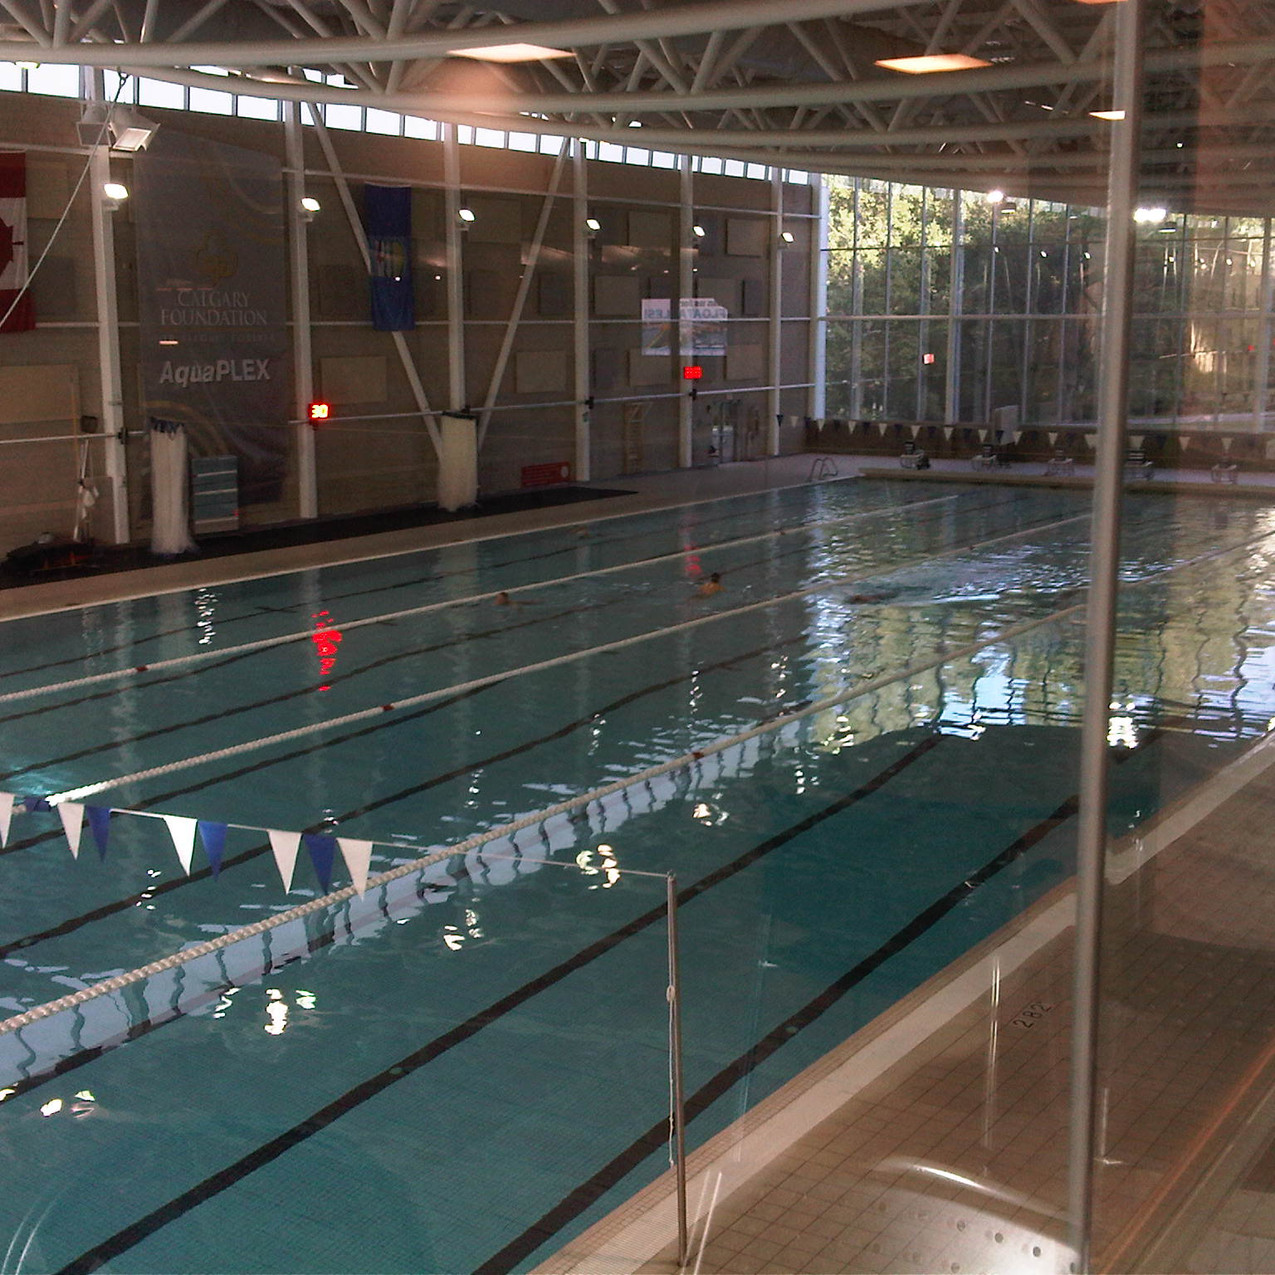 #4 - Talisman/Repsol Training Pool